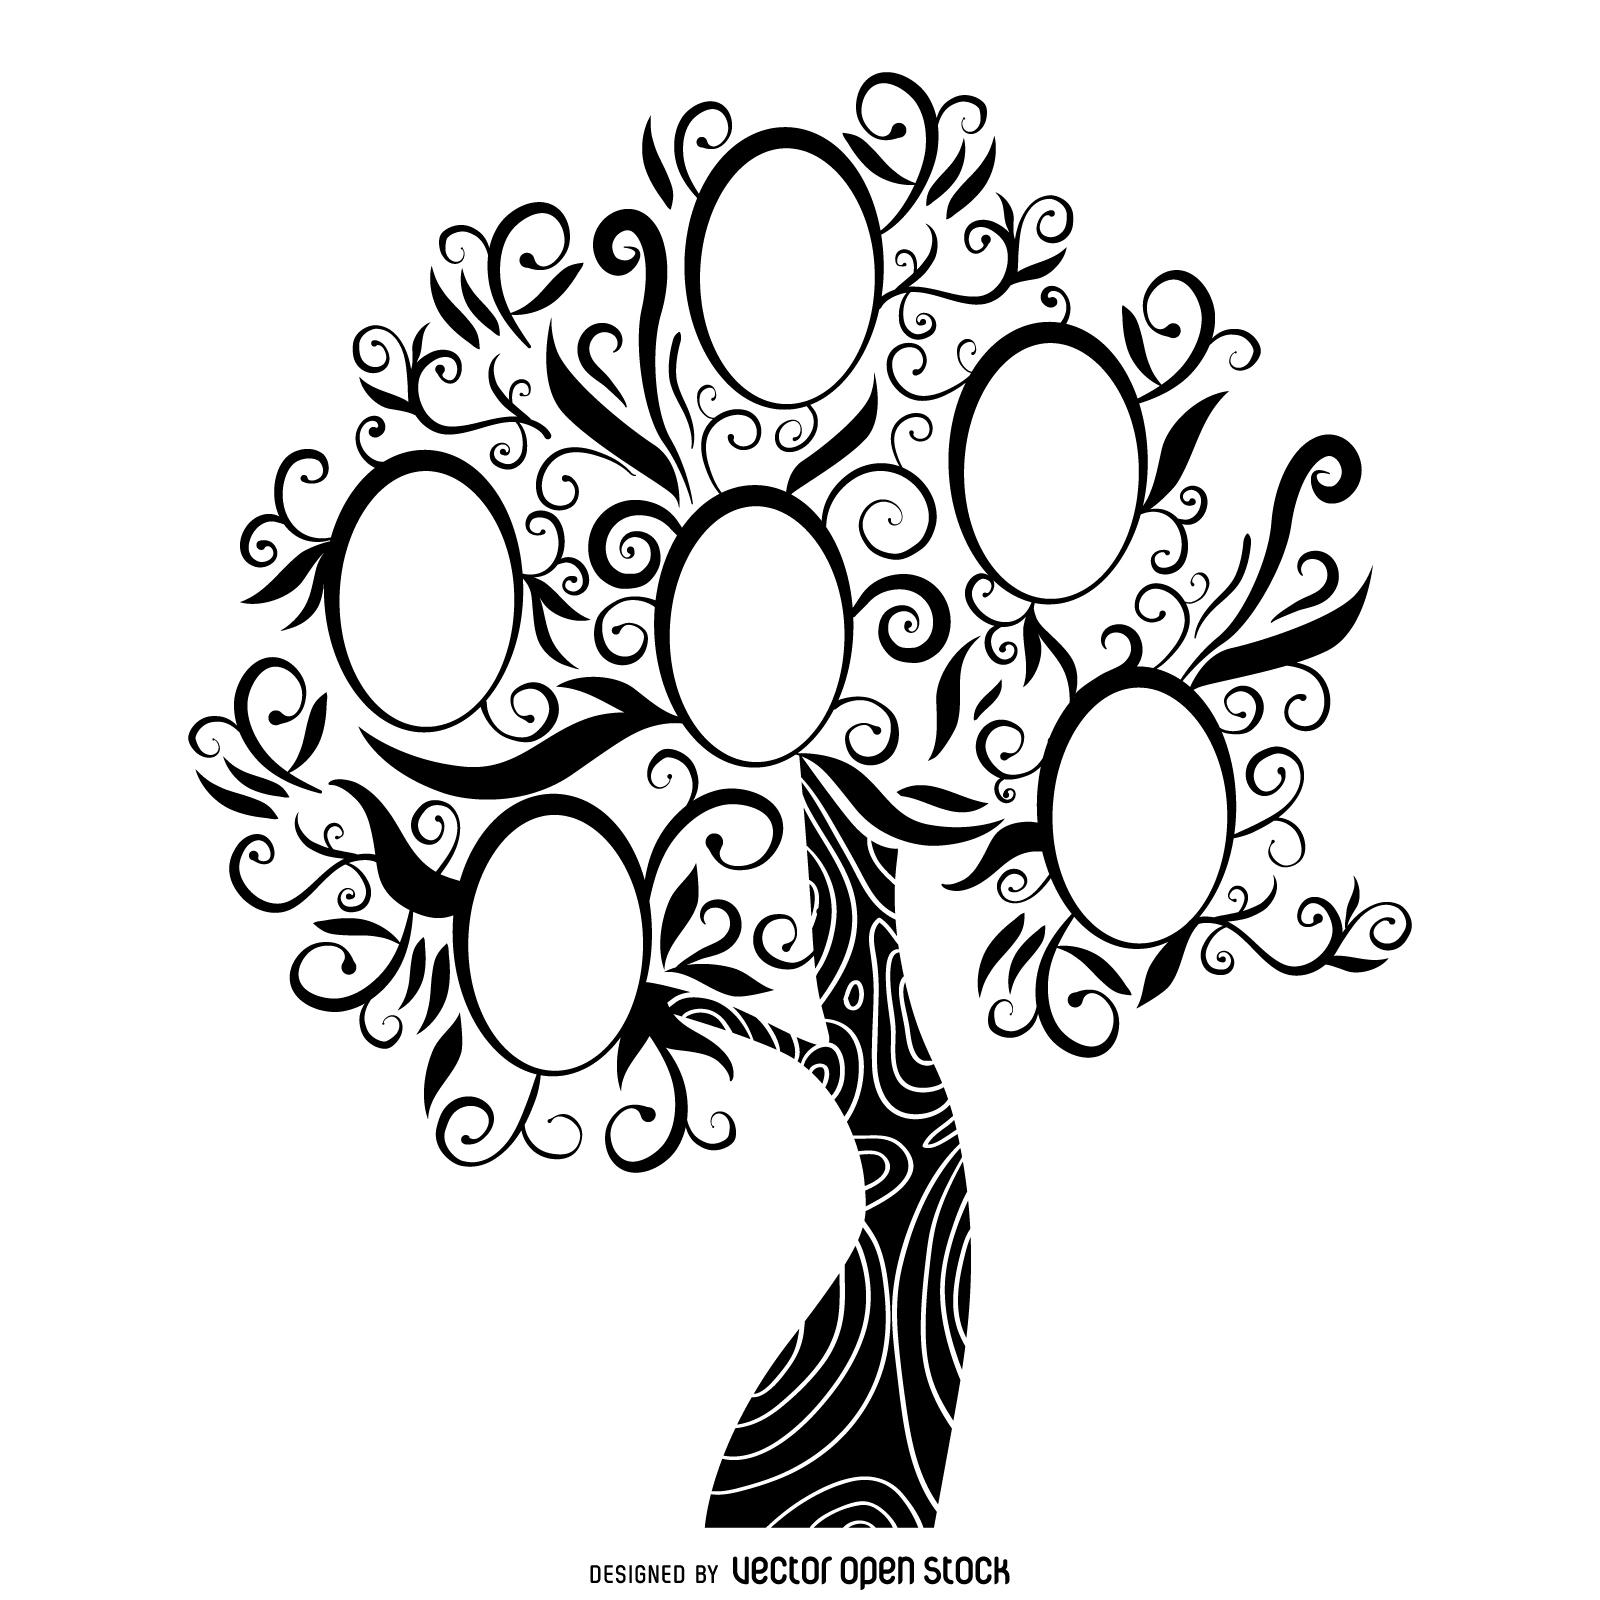 1600x1600 Black And White Family Tree